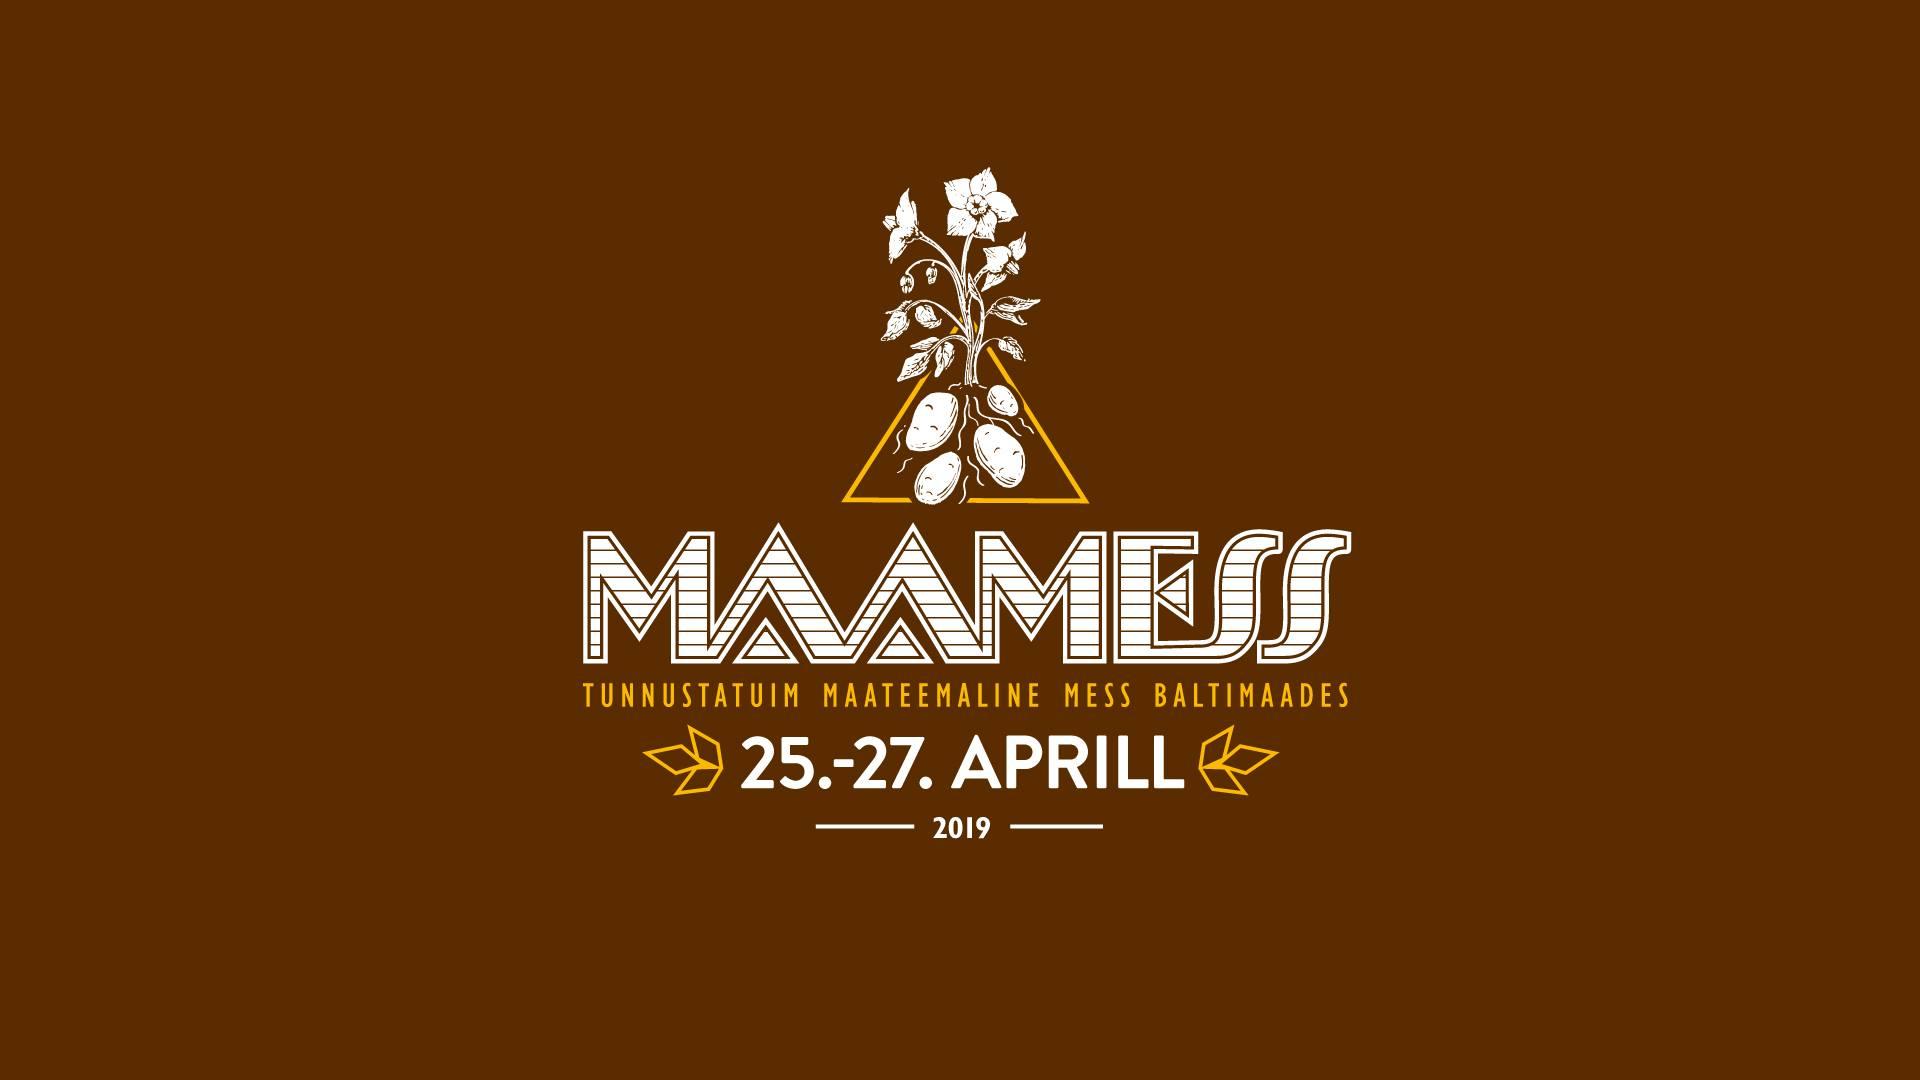 ORGANIQ izstādē MAAMESS 2019 Tartu, Igaunijā.